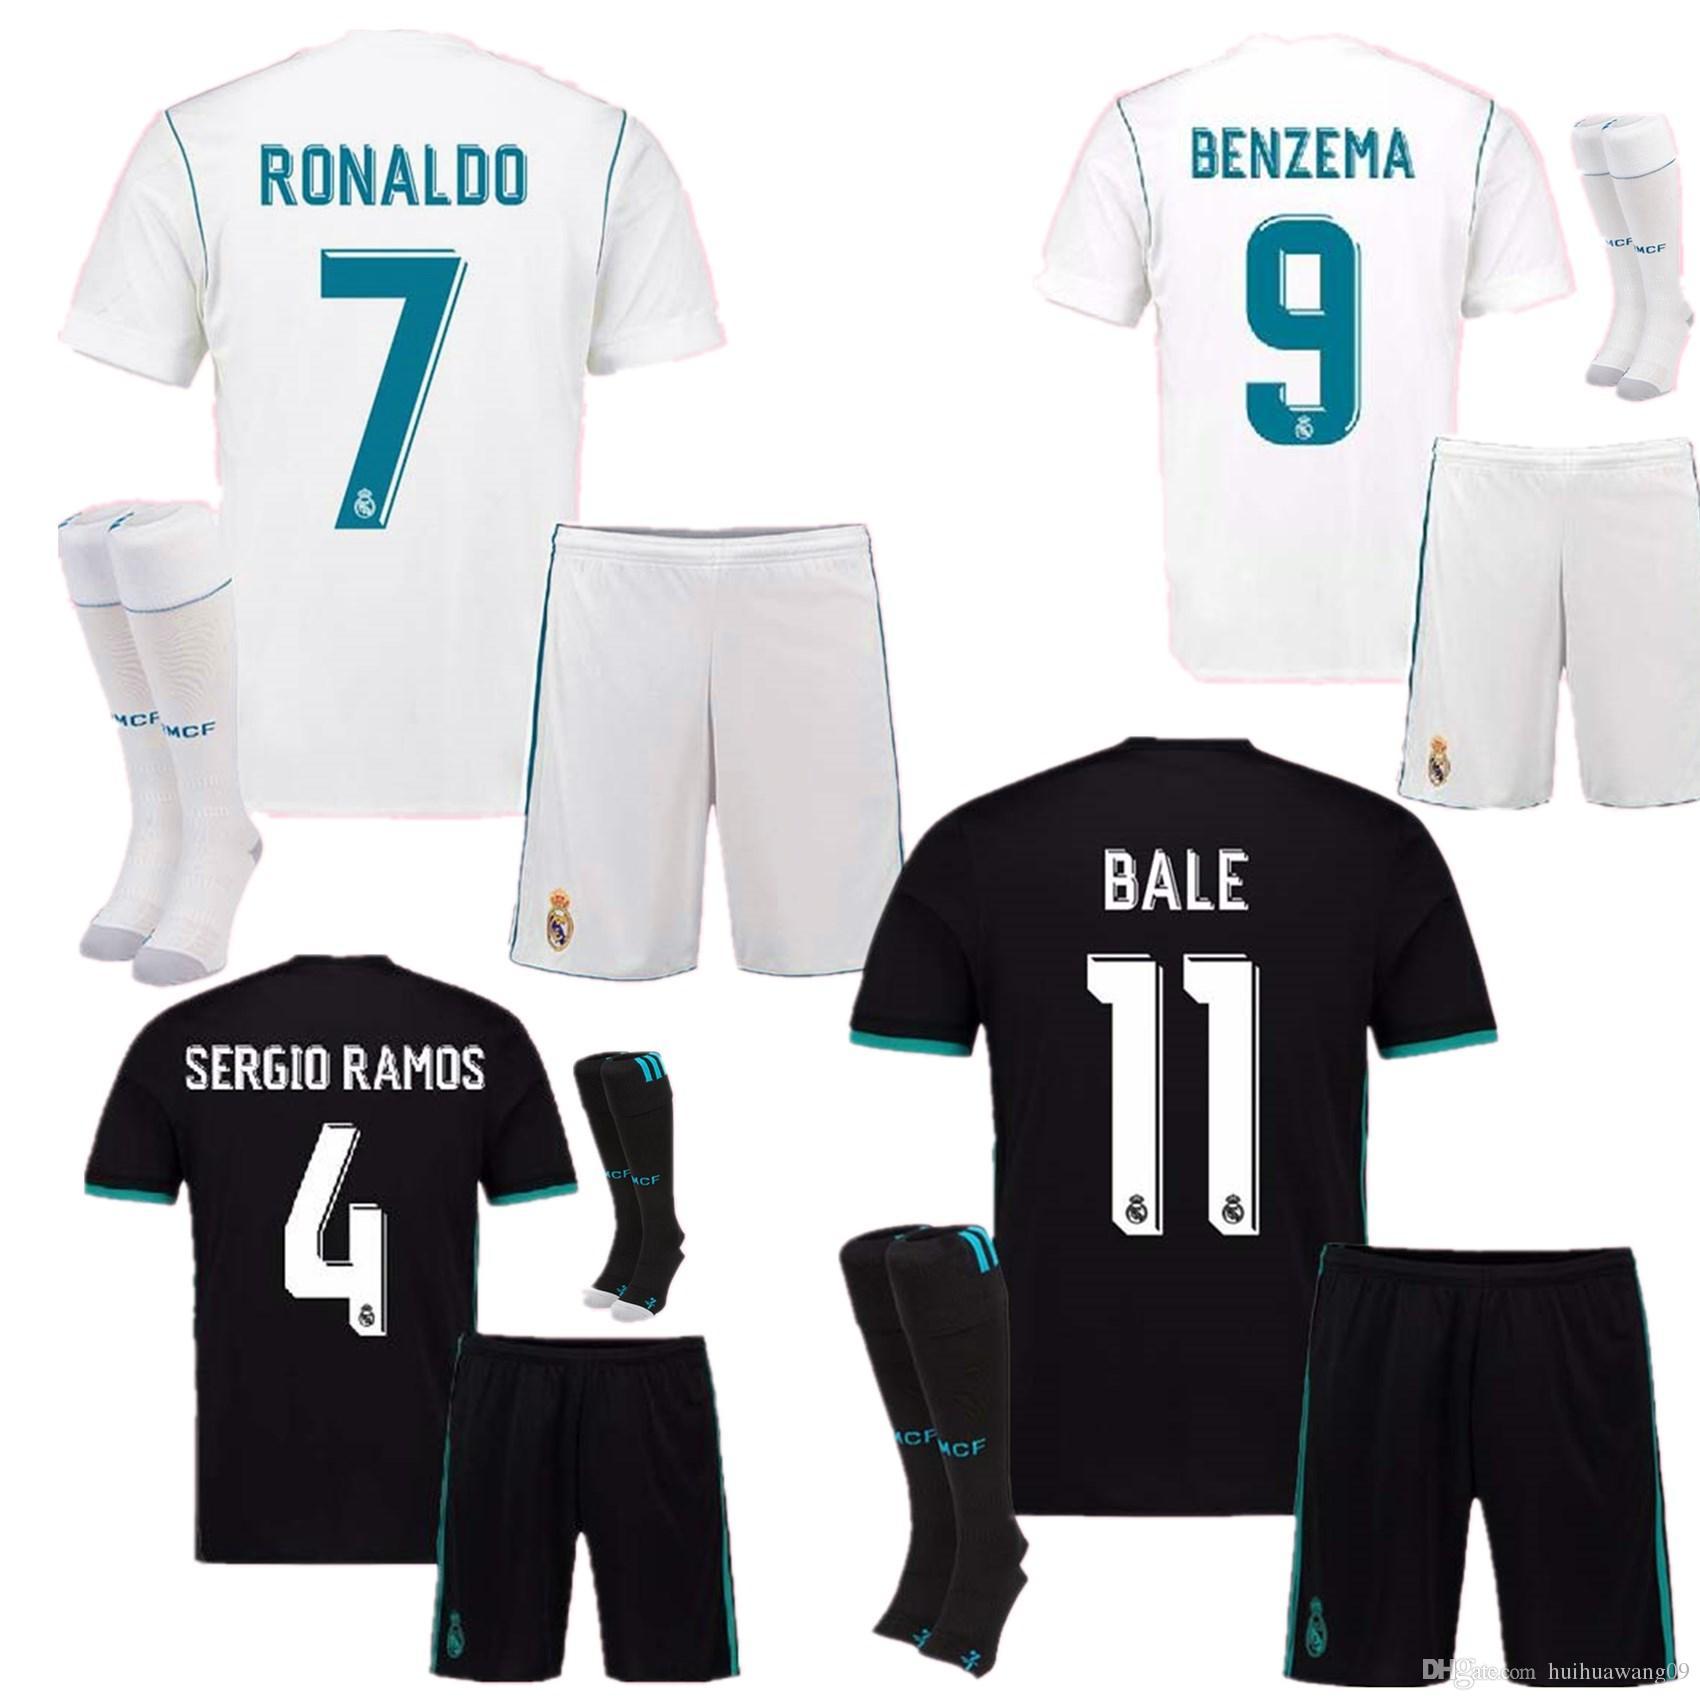 ebf2e87fe94 ... authentic patch custom jersey black 26f7b 44779 wholesale 17 18 real  madrid soccer jersey kit uniform